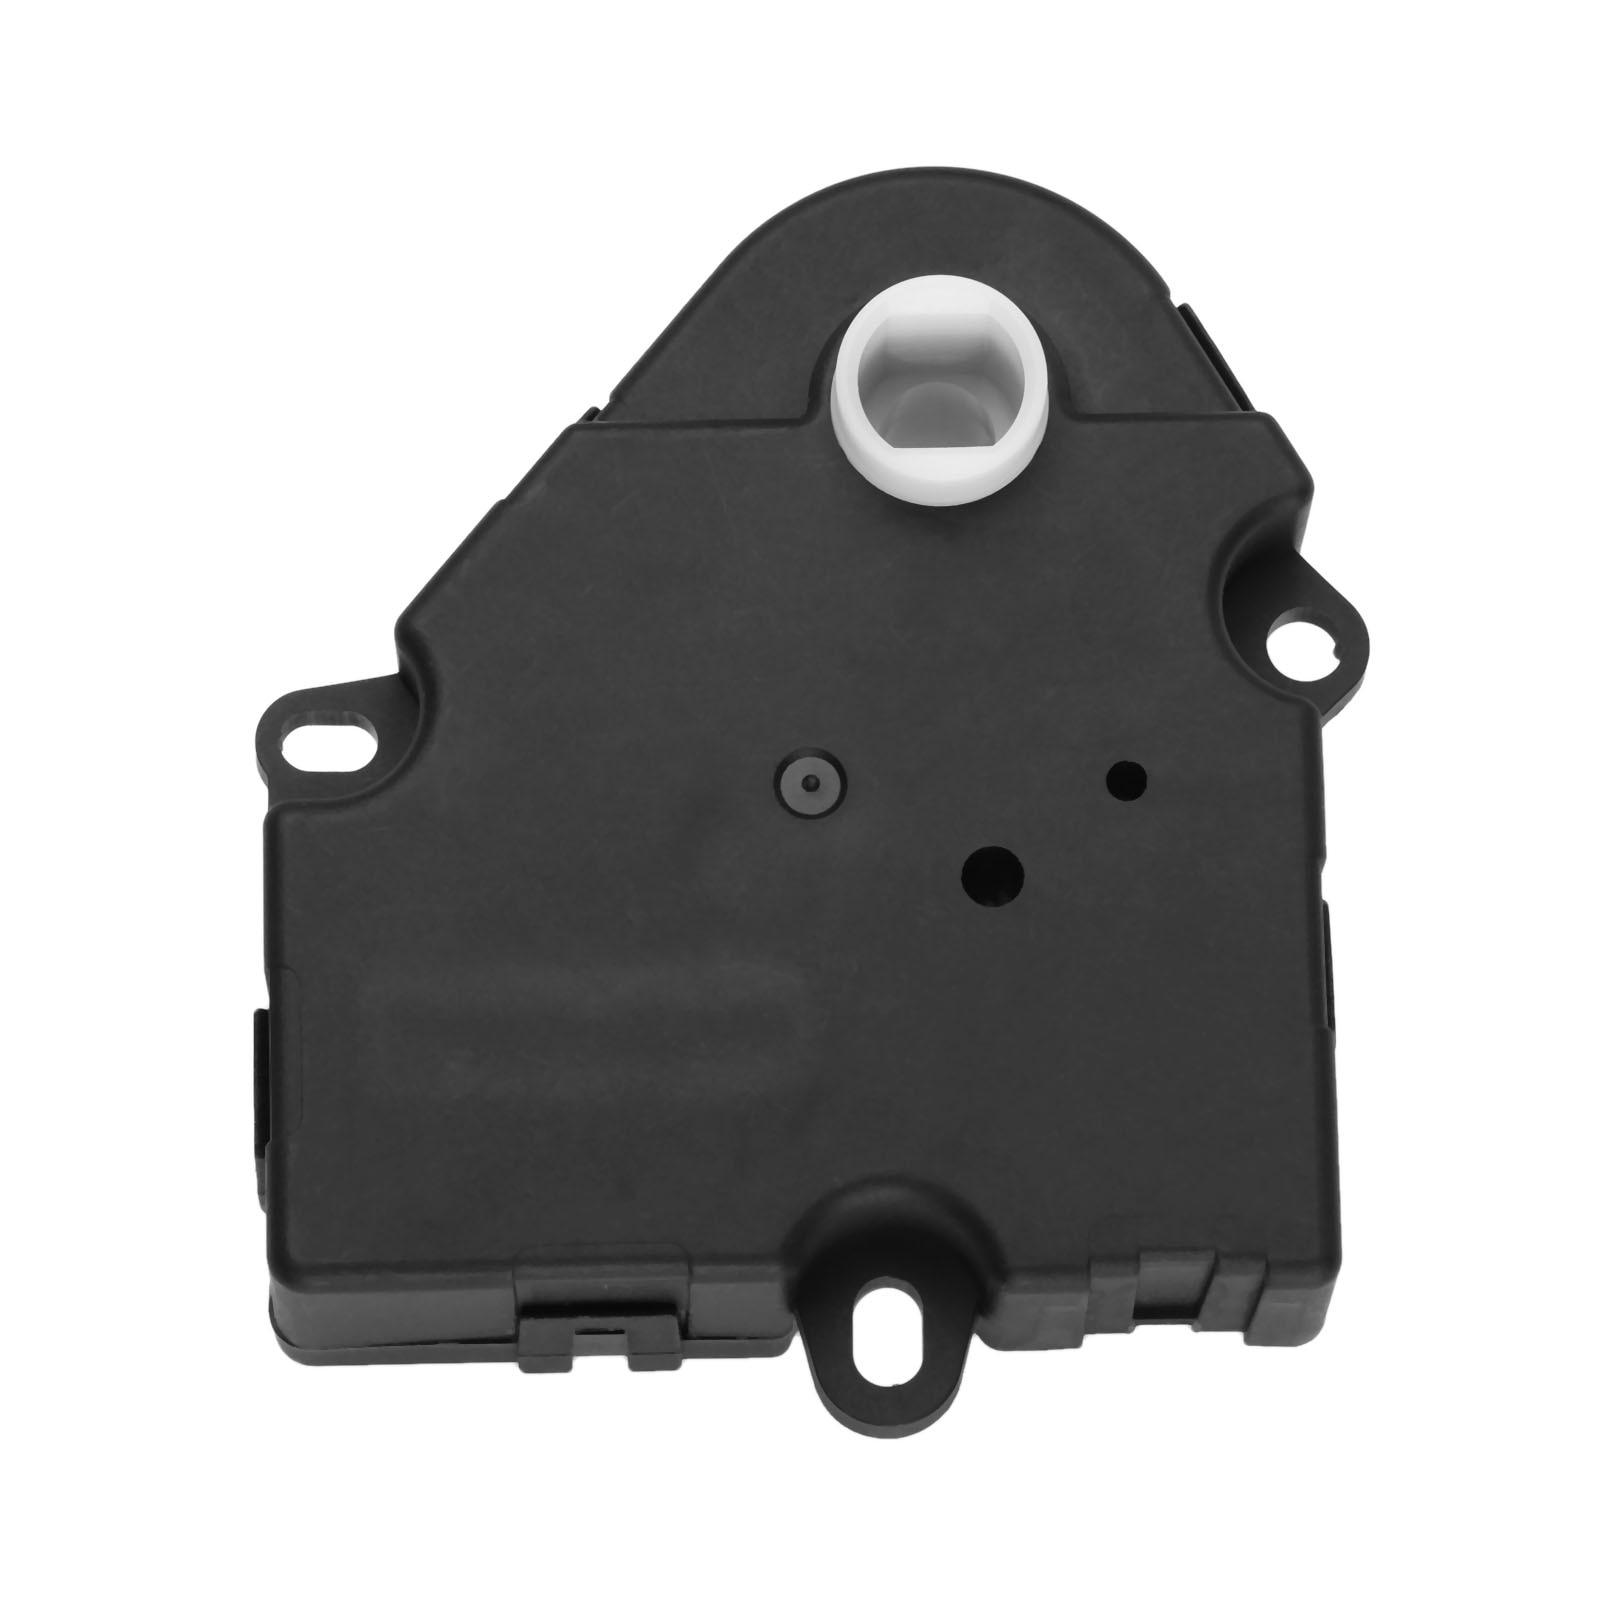 Yetaha HVAC Heater Air Blend Door Actuator For Mercedes-Benz ML320 ML350 ML430 ML500 ML55 AMG 604-938 1638200108